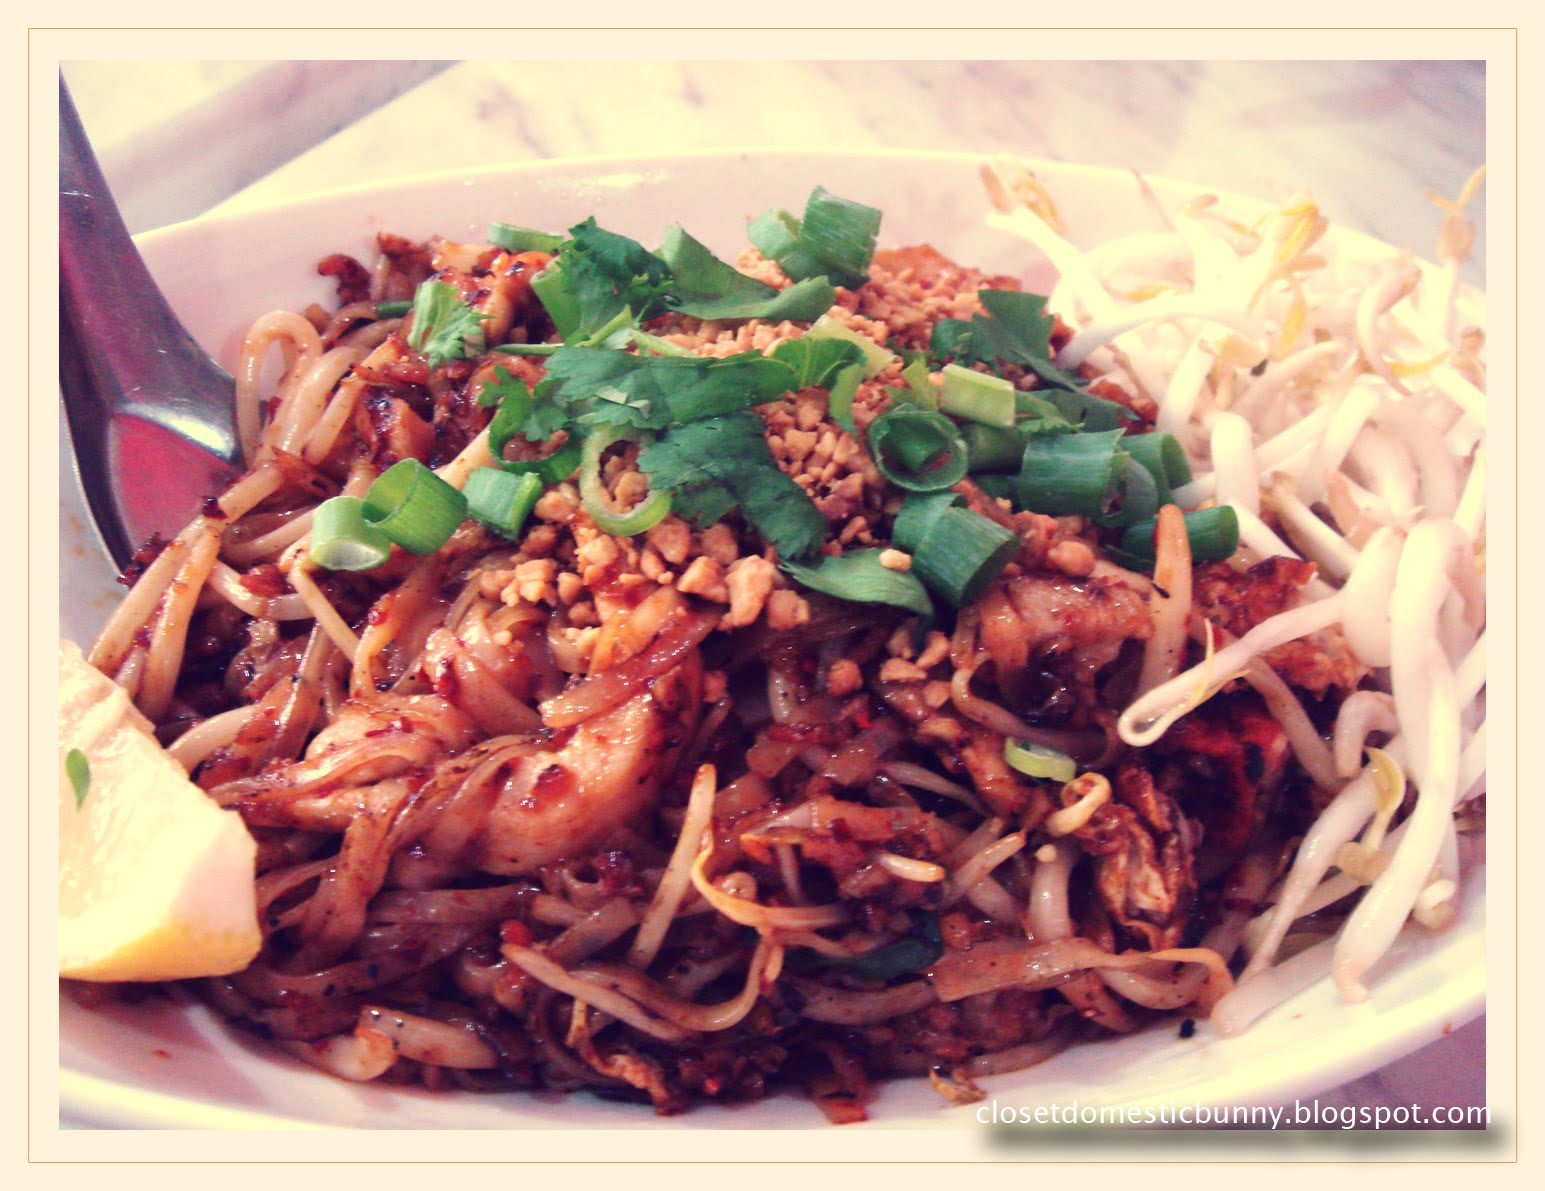 Spices Thai Cafe Mira Mesa Menu